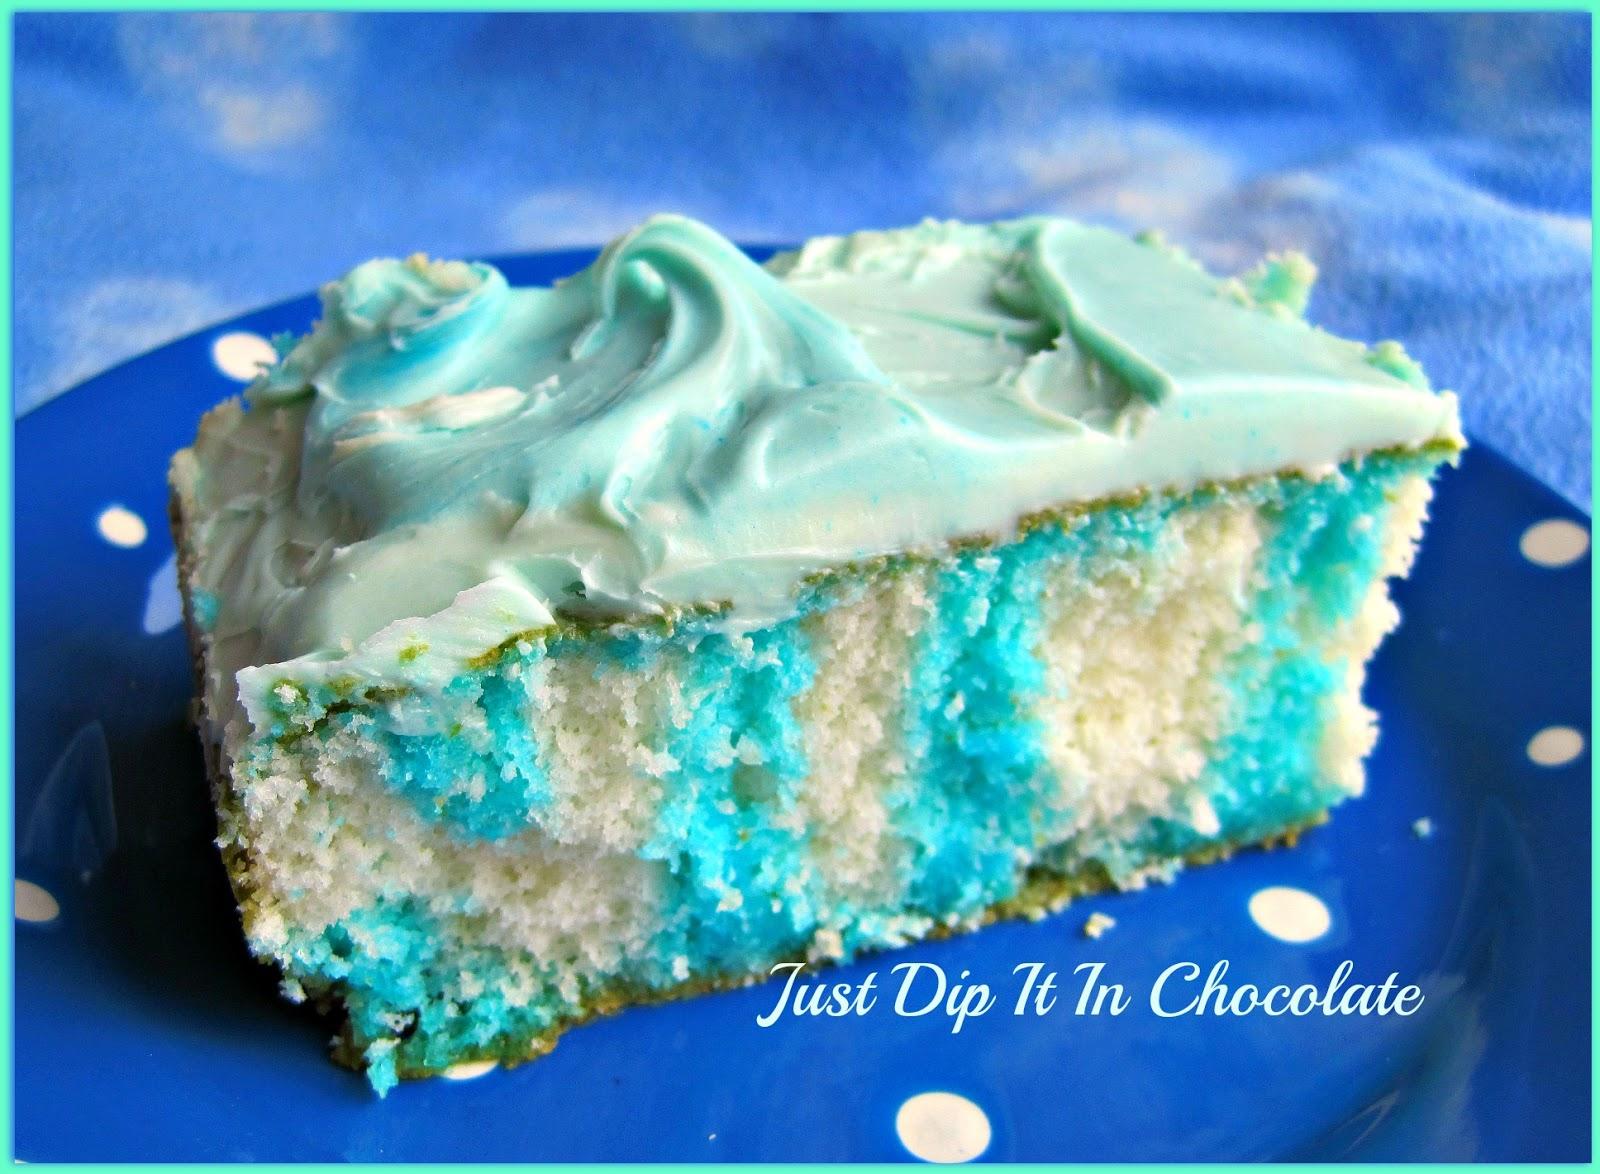 Blue Jello Poke Cake Berry Blue Jell-o Poke Cake